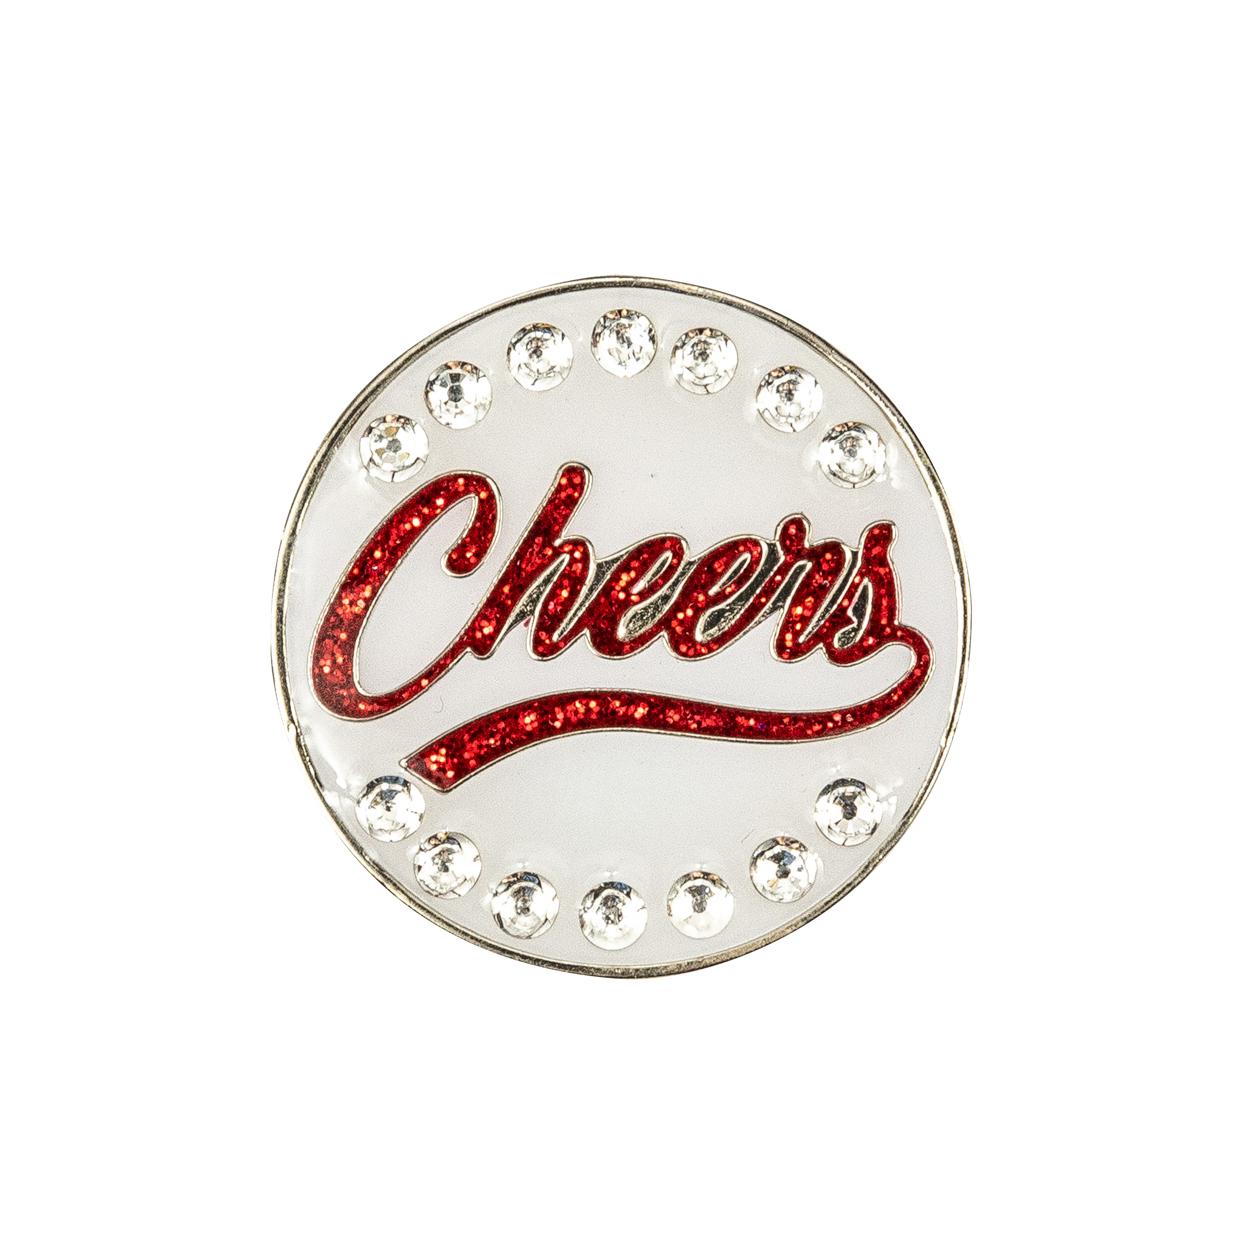 73. Cheers